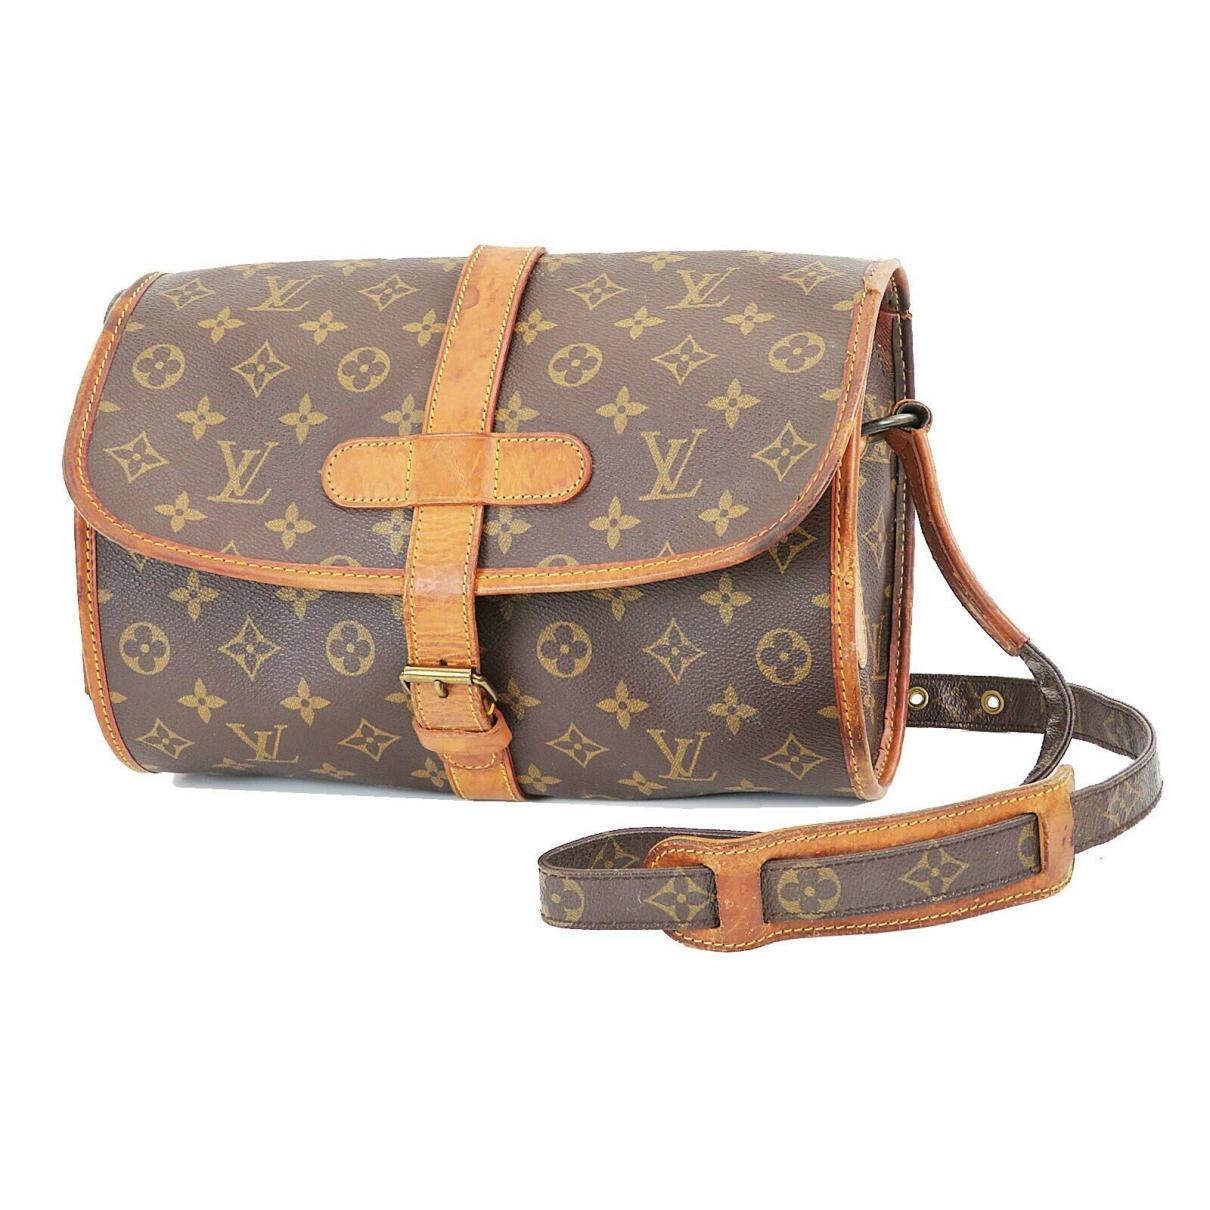 Louis Vuitton - Sac a main Marne pour femme en cuir - marron